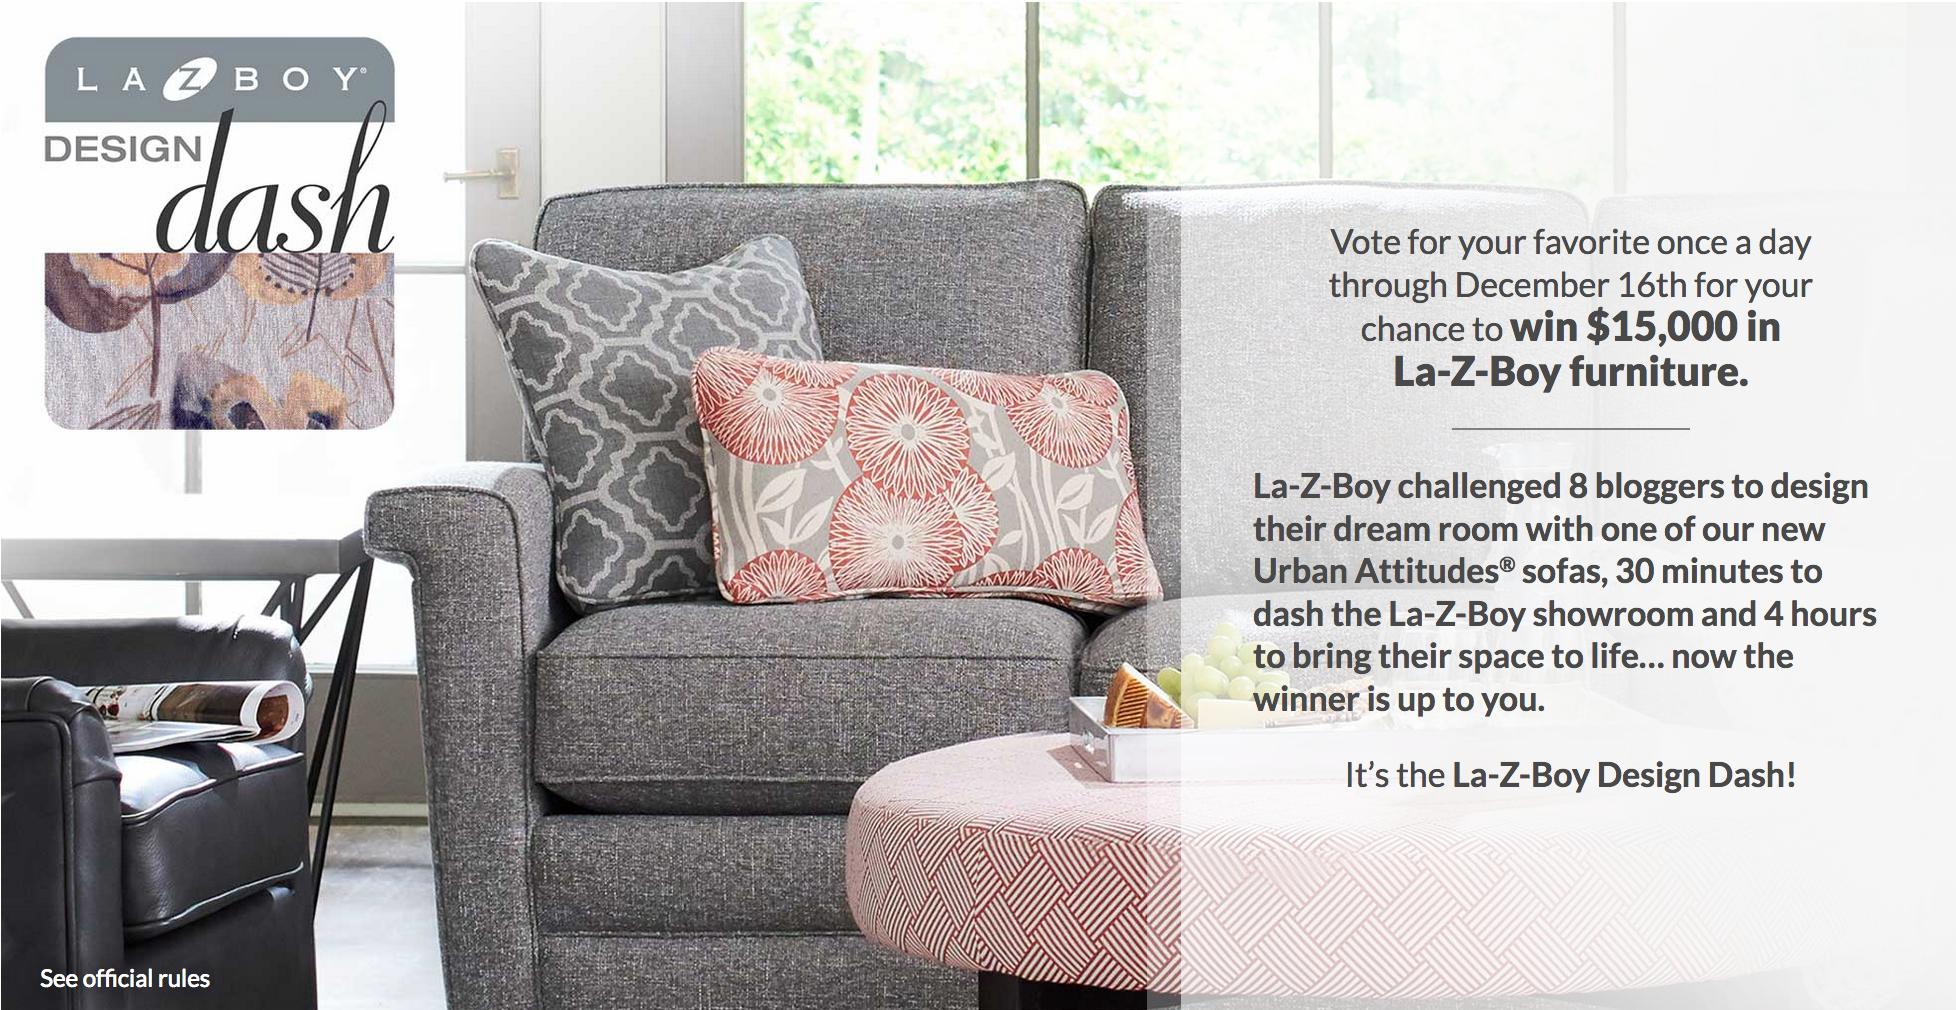 It's the La-Z-Boy Design Dash!